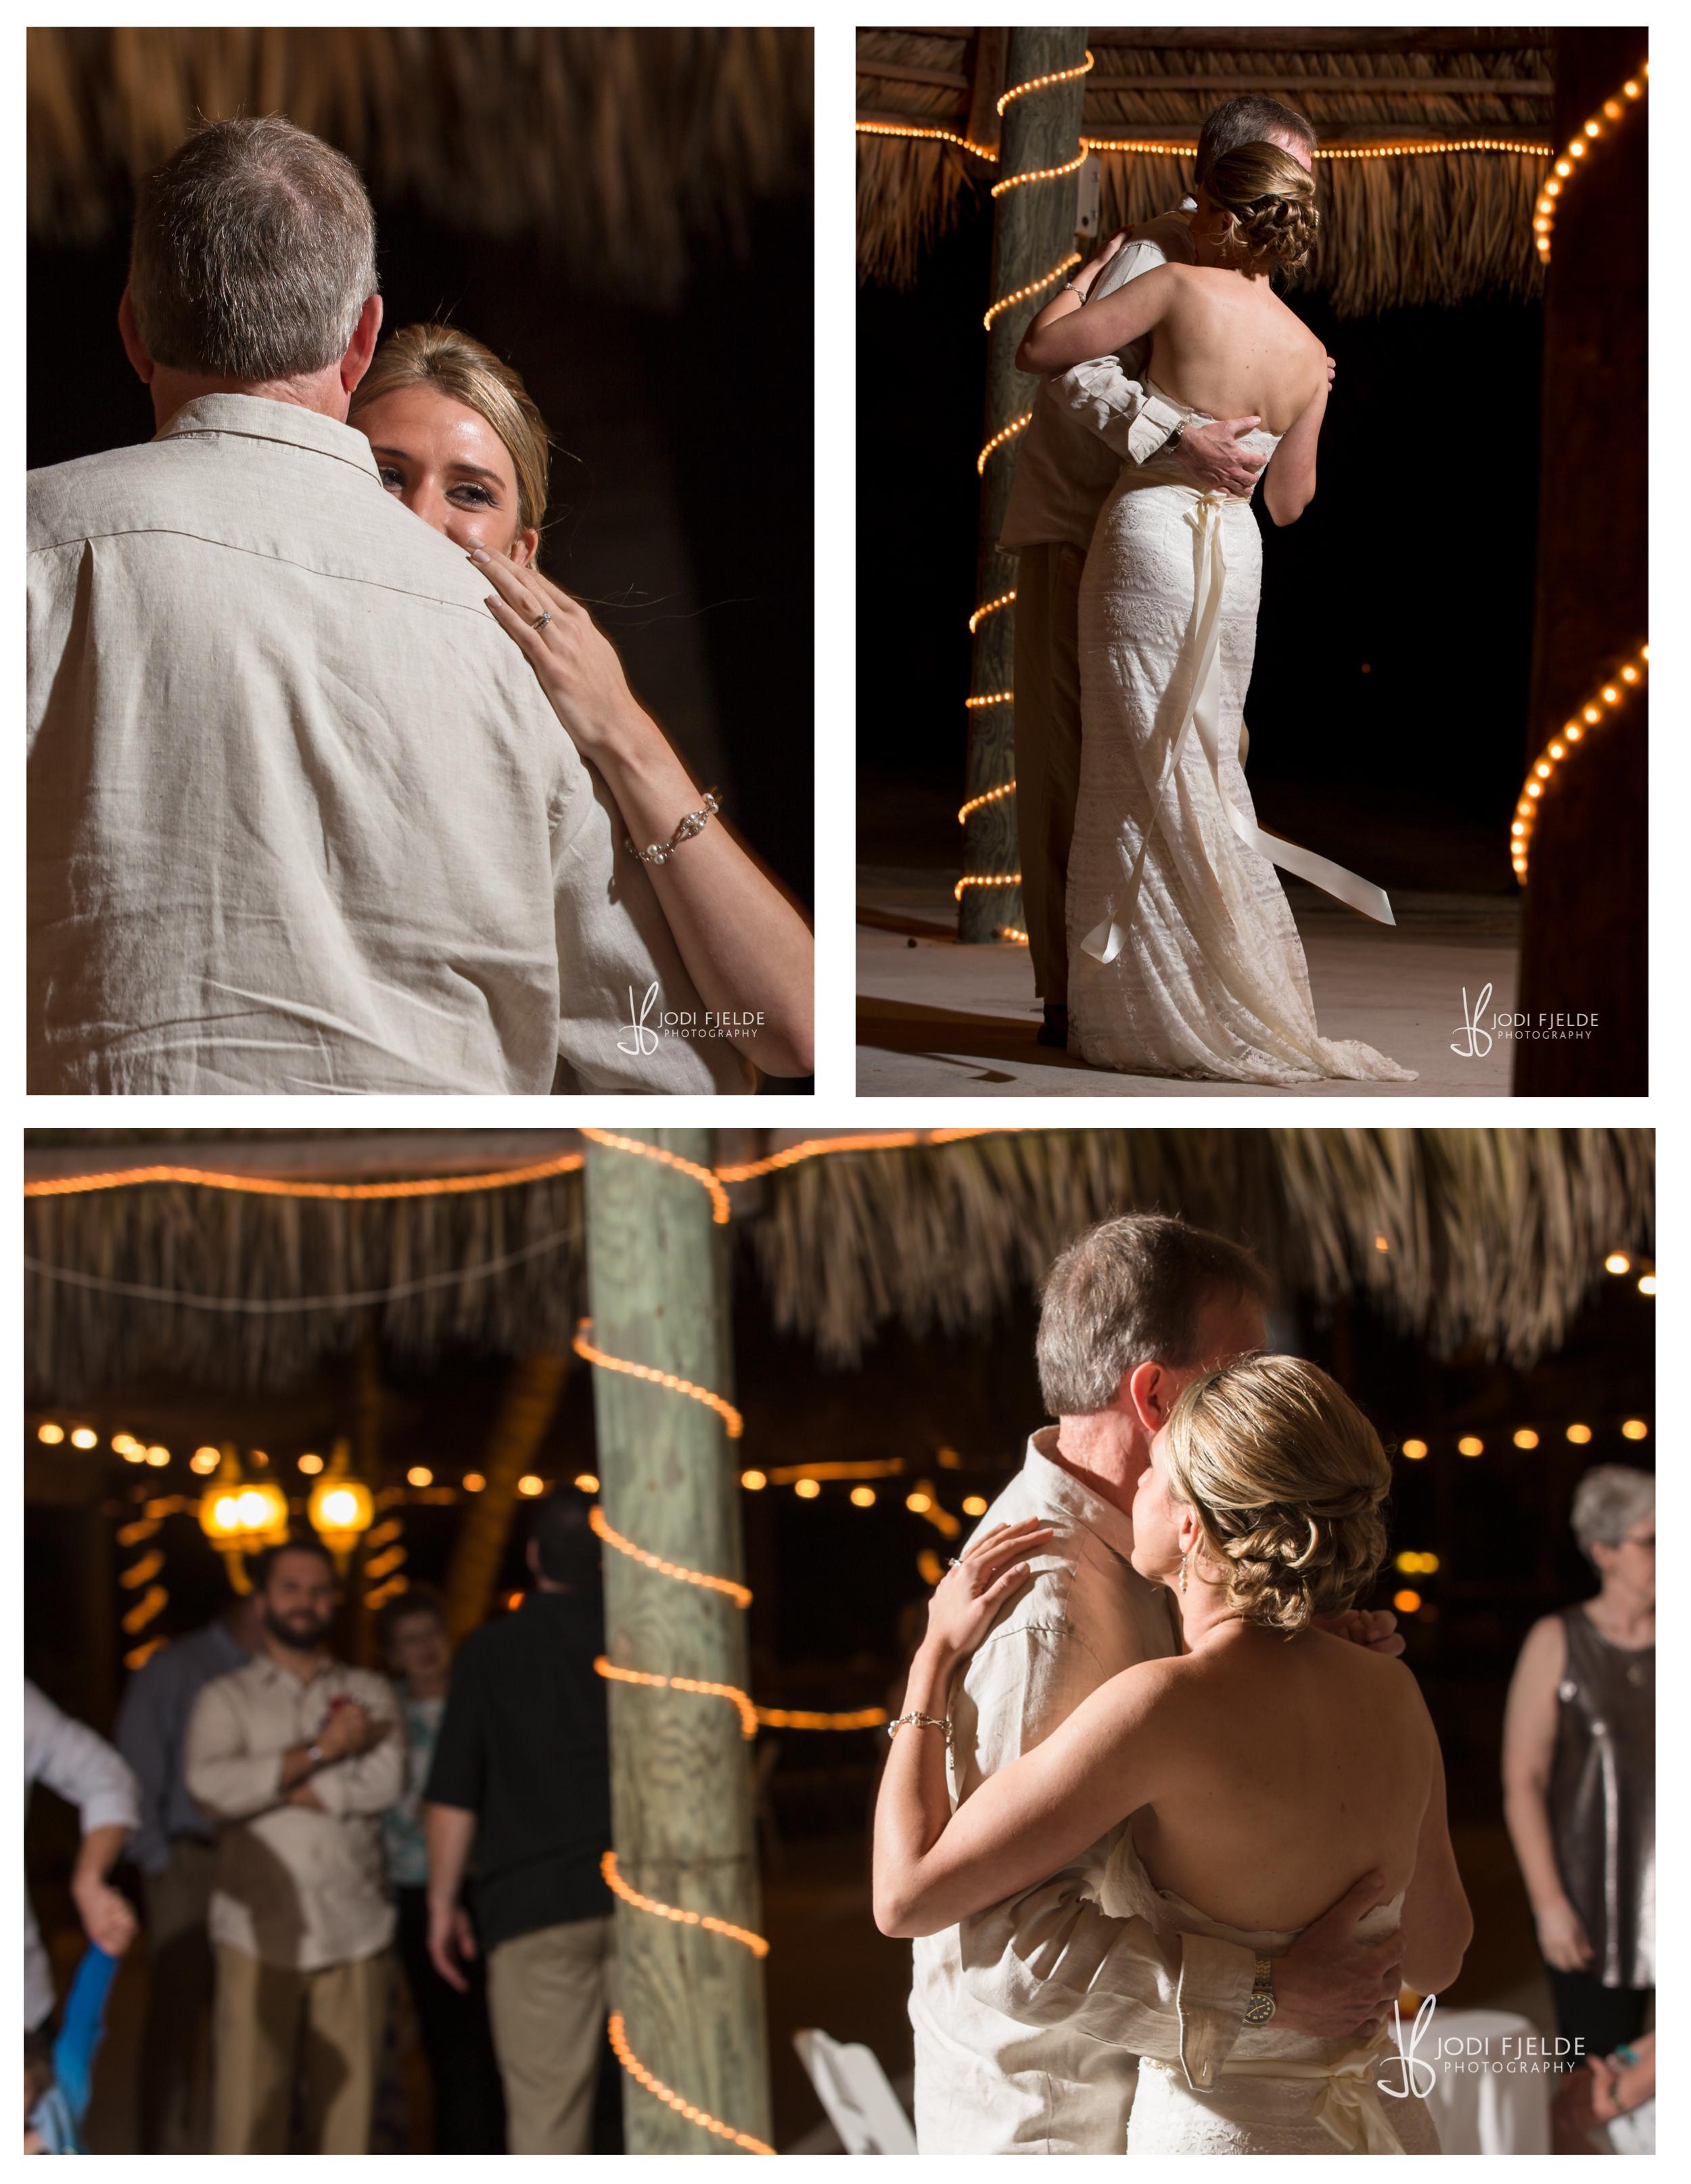 Cocconut_Cove_&_ Marina_ wedding_Kayla_and_Patrick 34.jpg